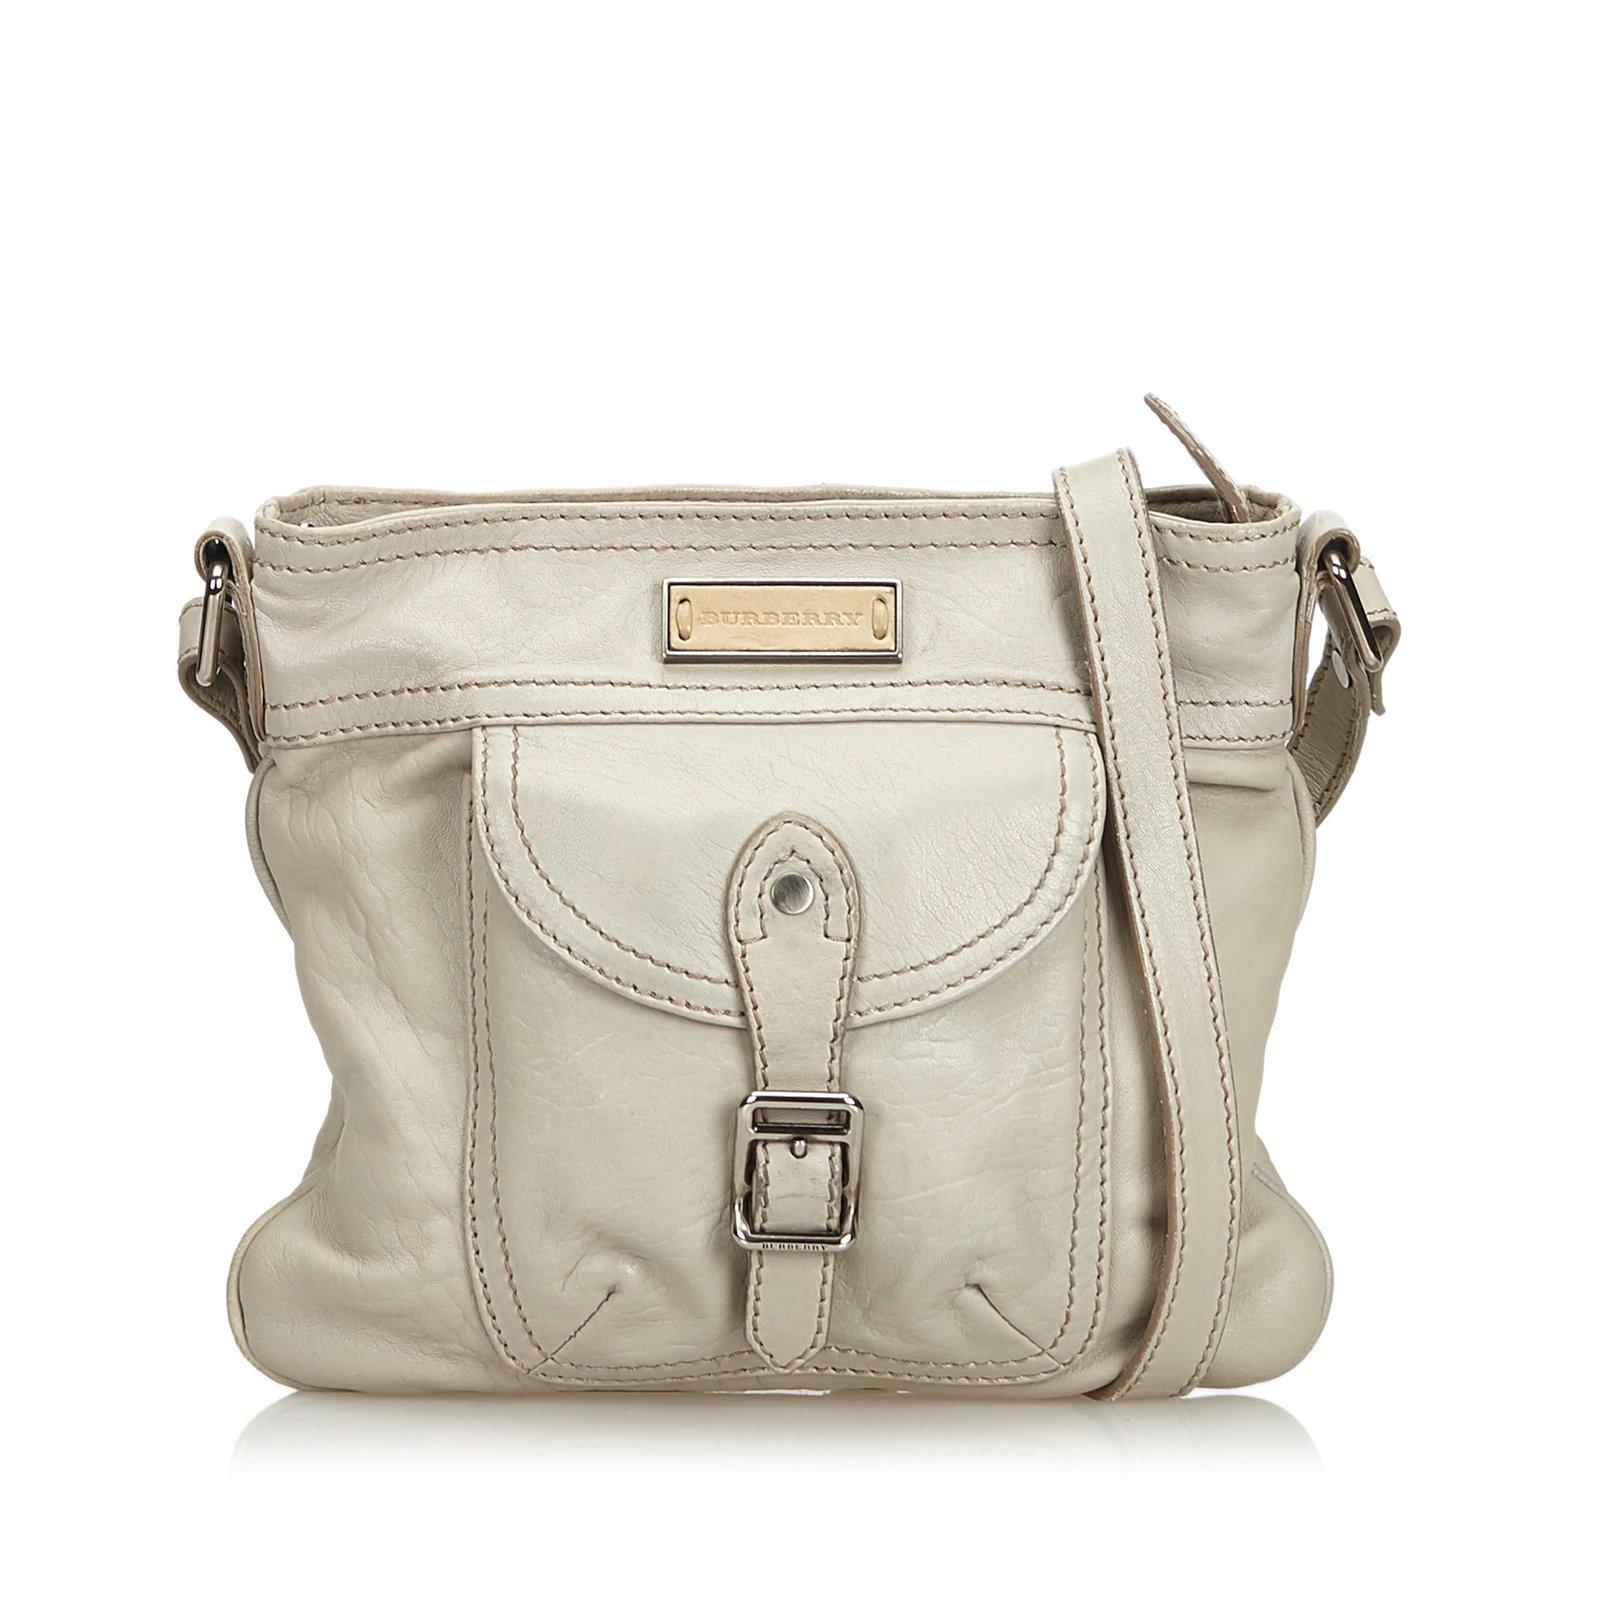 Burberry Leather Shoulder Bag Handbags Leather f4565cd1cdea5